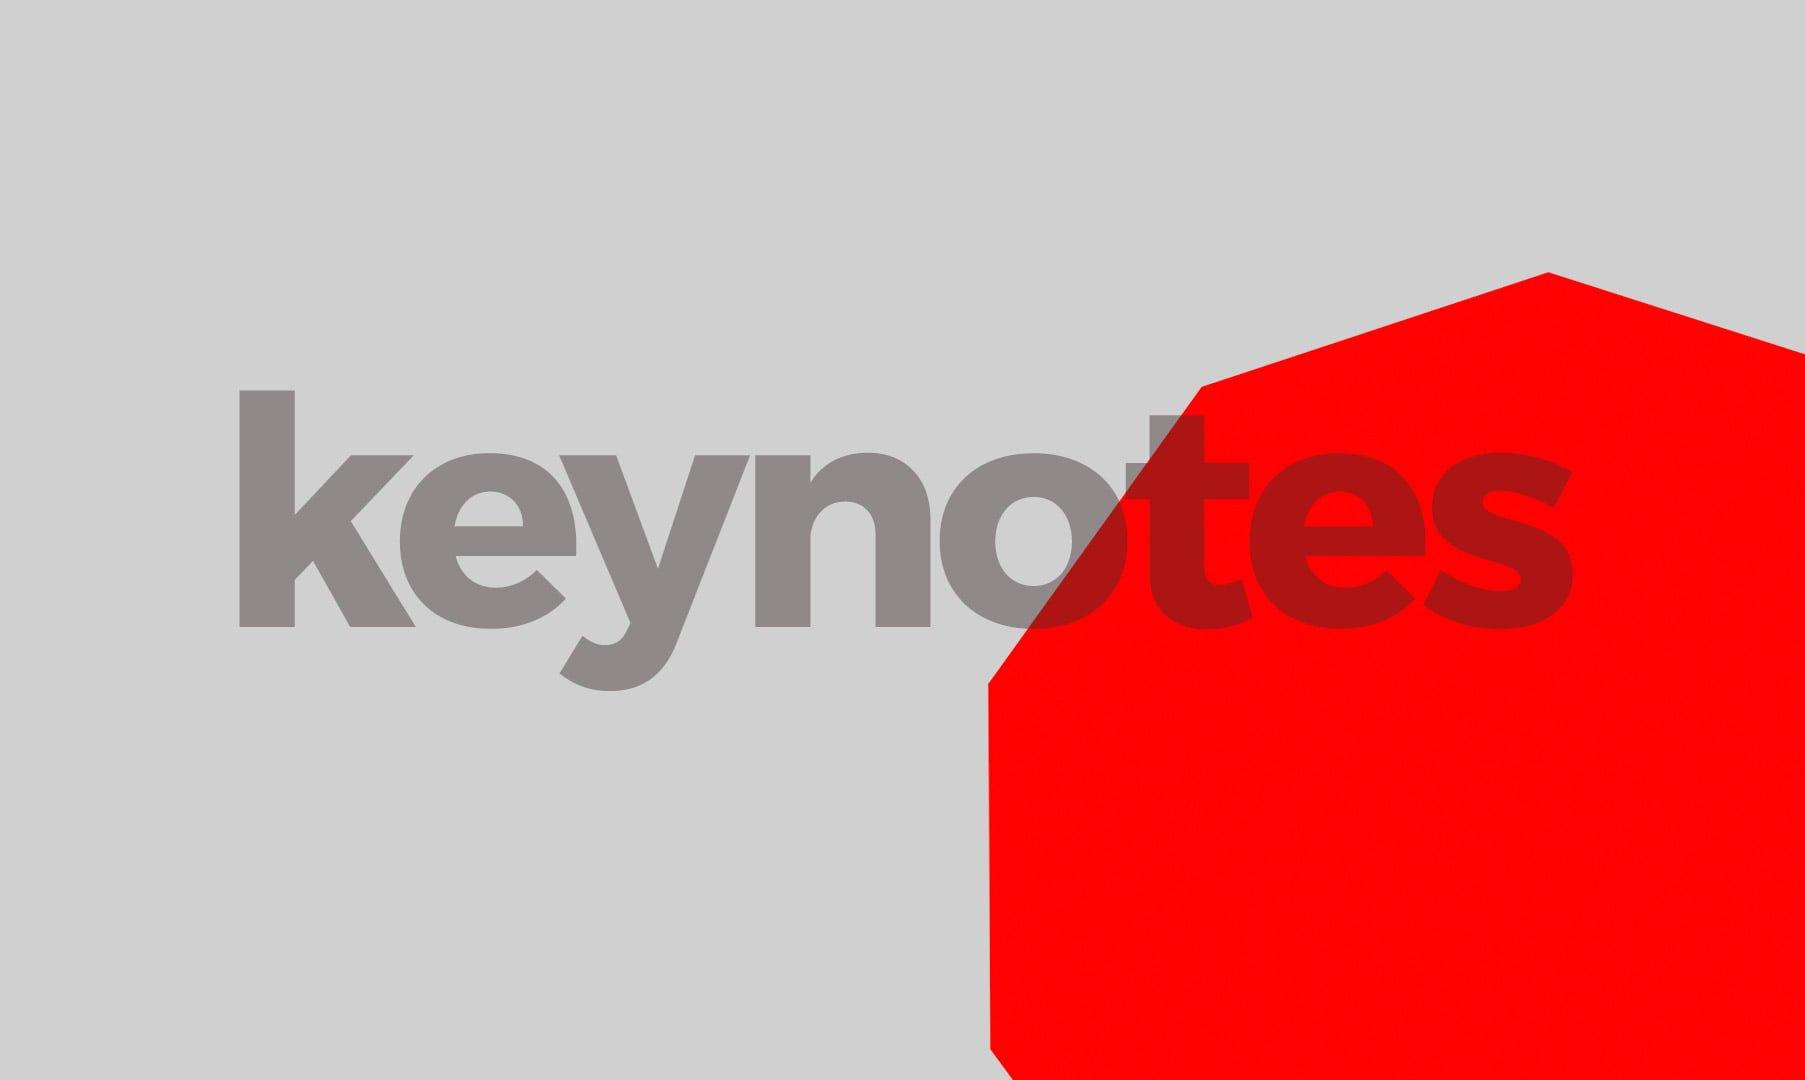 keynotes gdm